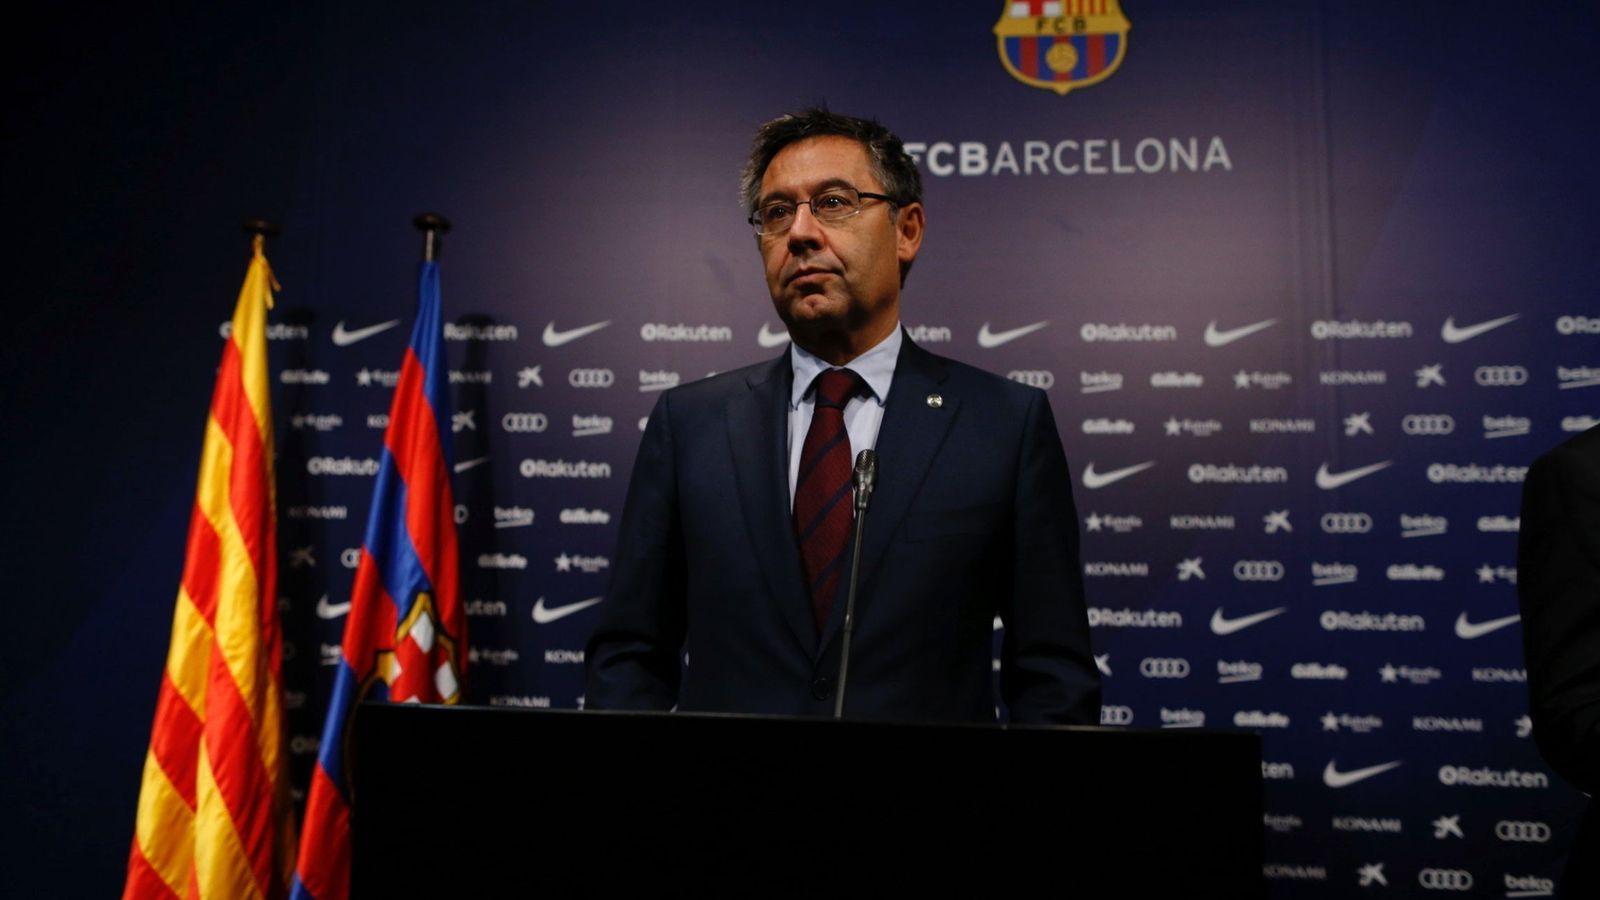 Foto: Josep Maria Bartomeu, presidente del FC Barcelona. (EFE)